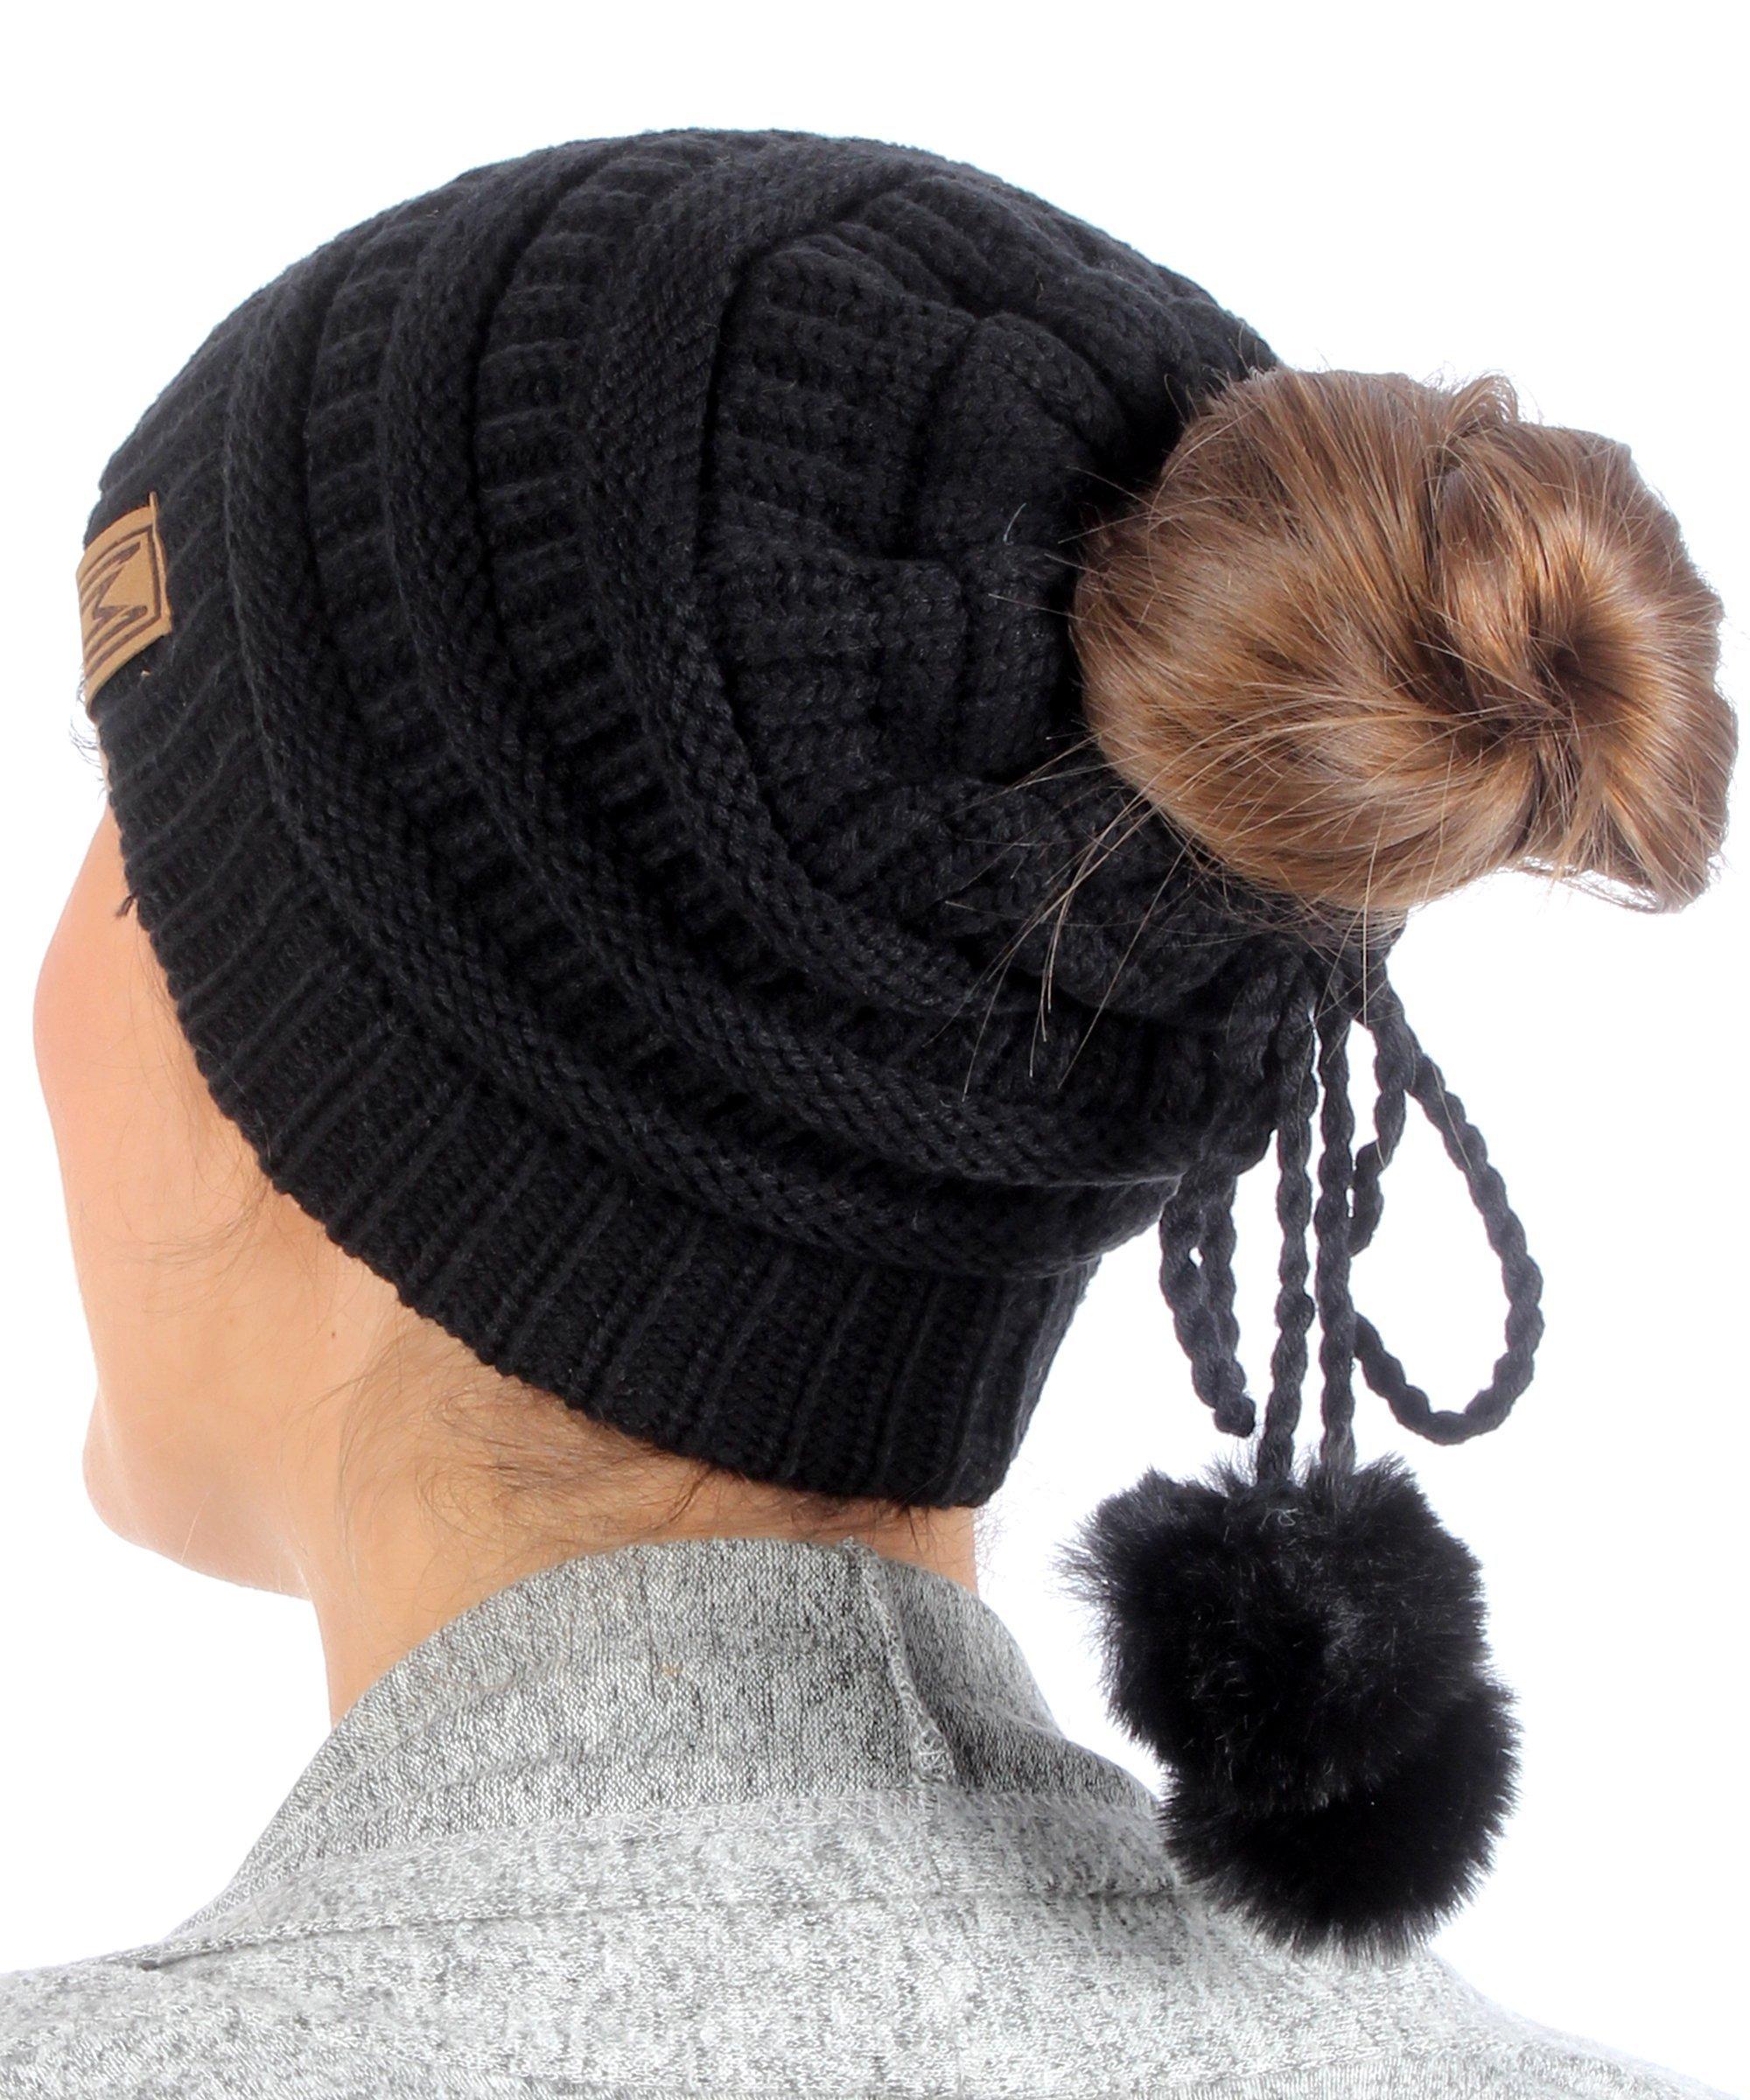 a6f50fa22a06f MIRMARU Women's Ponytail Messy Bun Beanie Ribbed Knit Hat Cap with ...